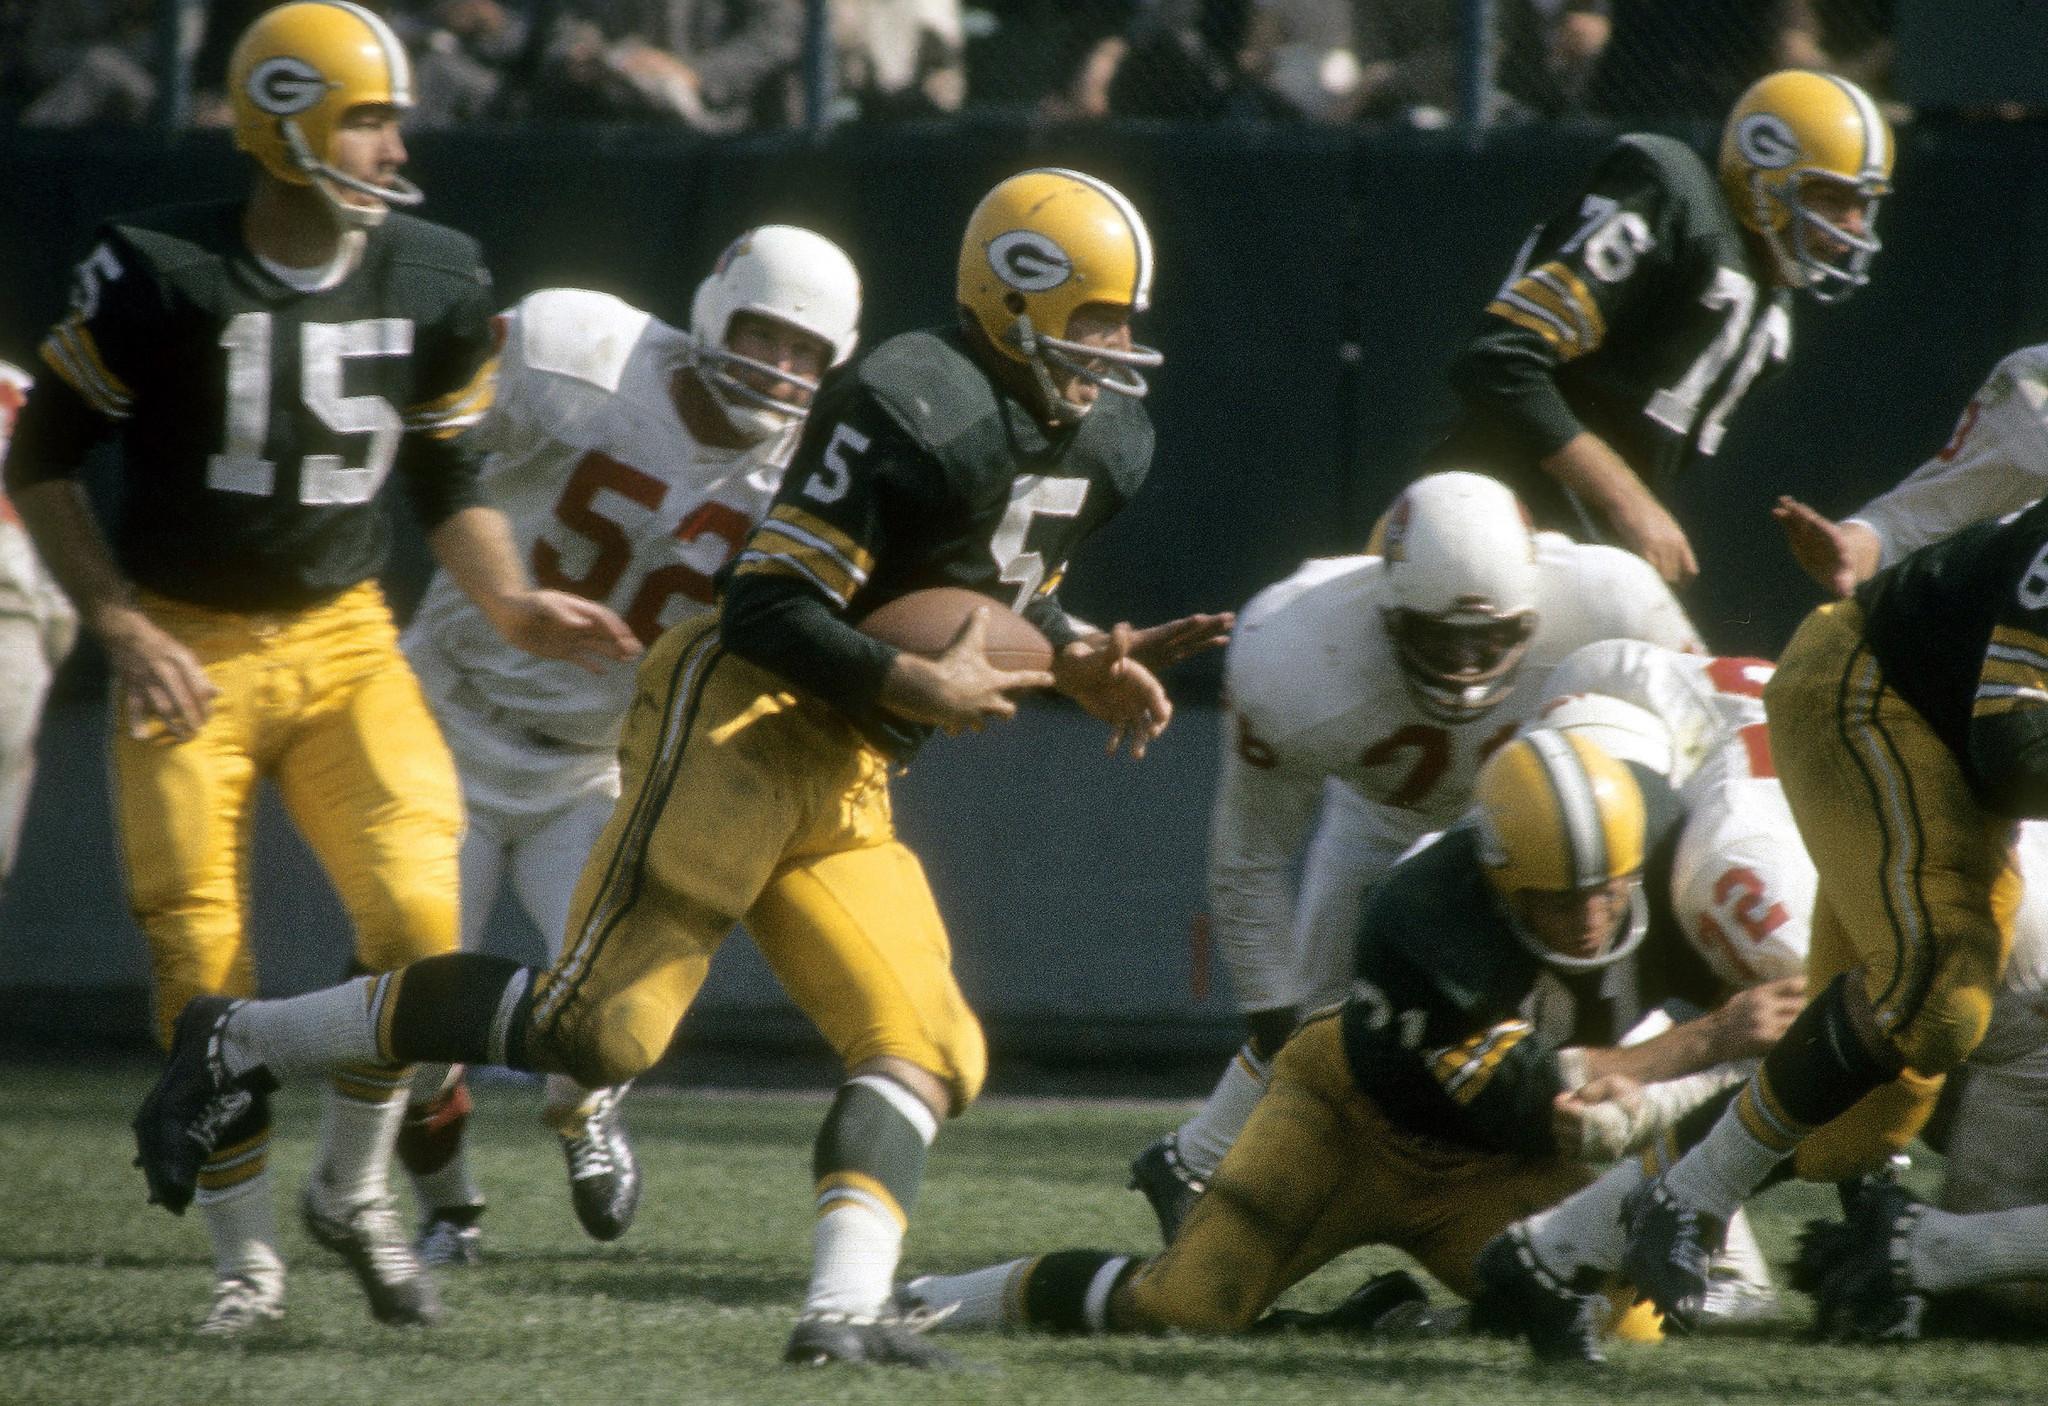 Focus Lee County >> NFL Hall of Famer Paul Hornung sues helmet maker Riddell ...